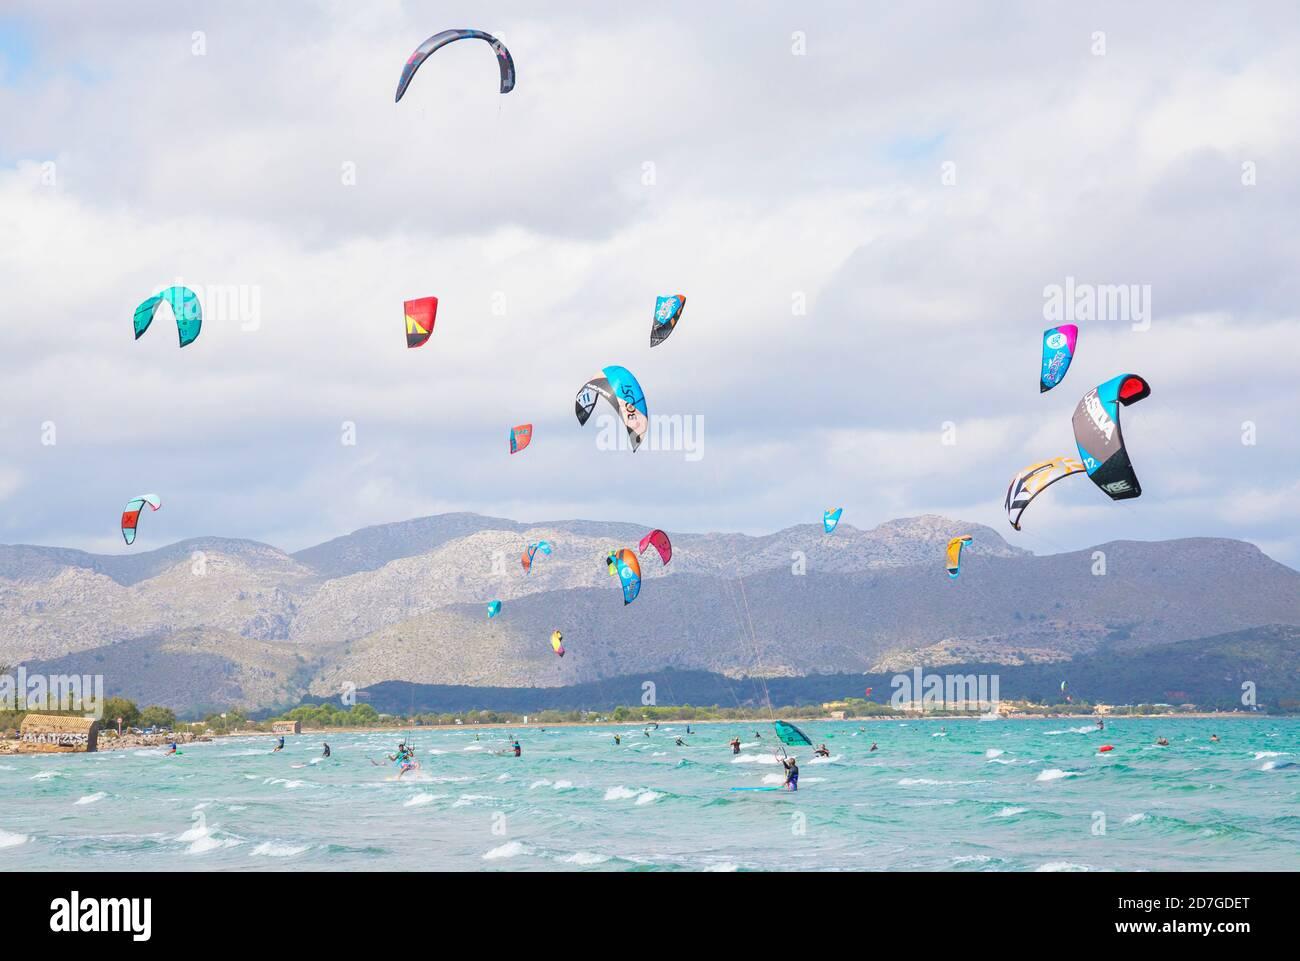 Gente Kitesurfing en la playa de Alcudia. Mallorca, Islas Baleares, España Foto de stock